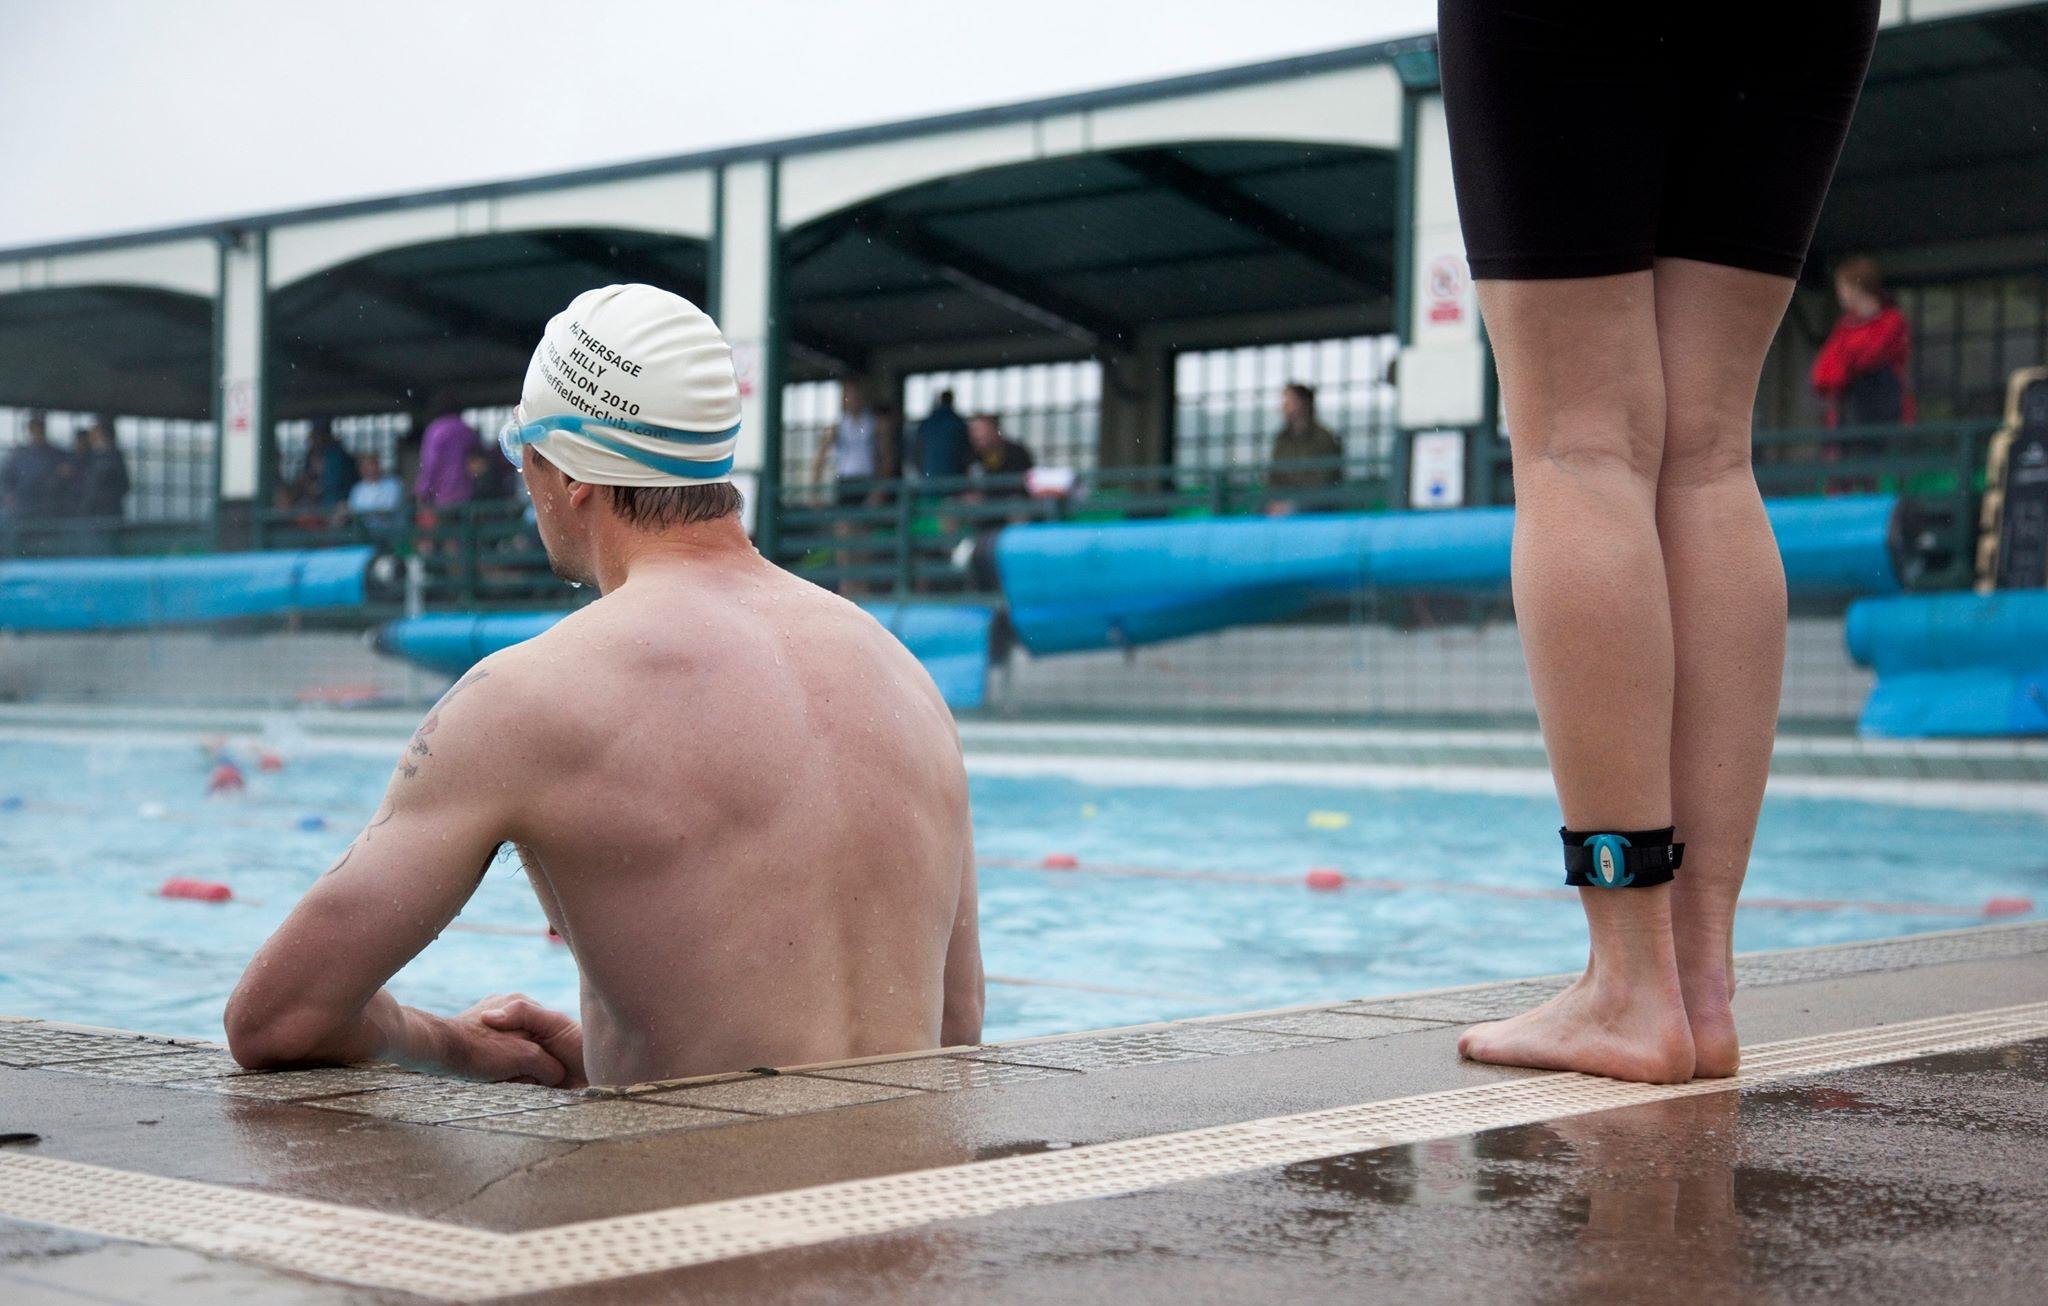 Hathersage swimming pool 2017 hathersage hilly triathlon - Hathersage open air swimming pool ...